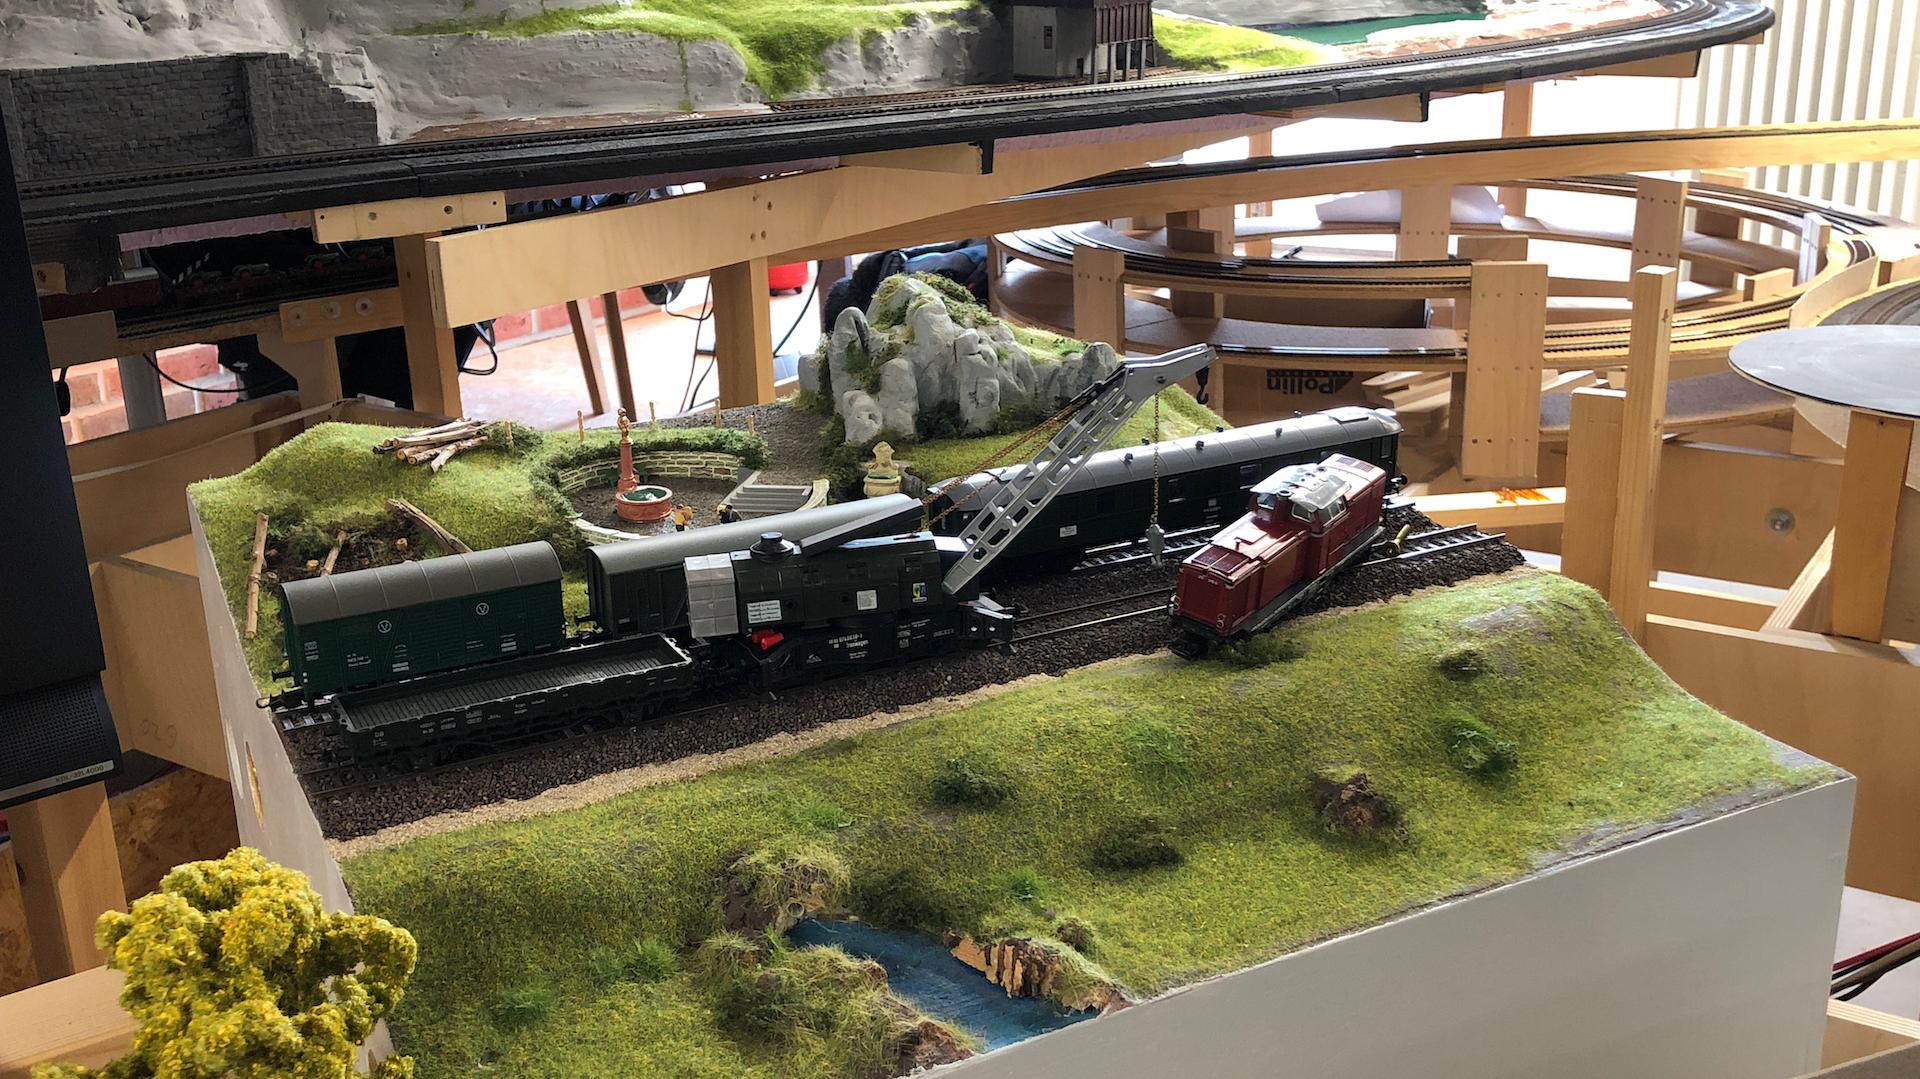 18_02_24_Schautag-Eisenbahnfreunde-Hameln_010